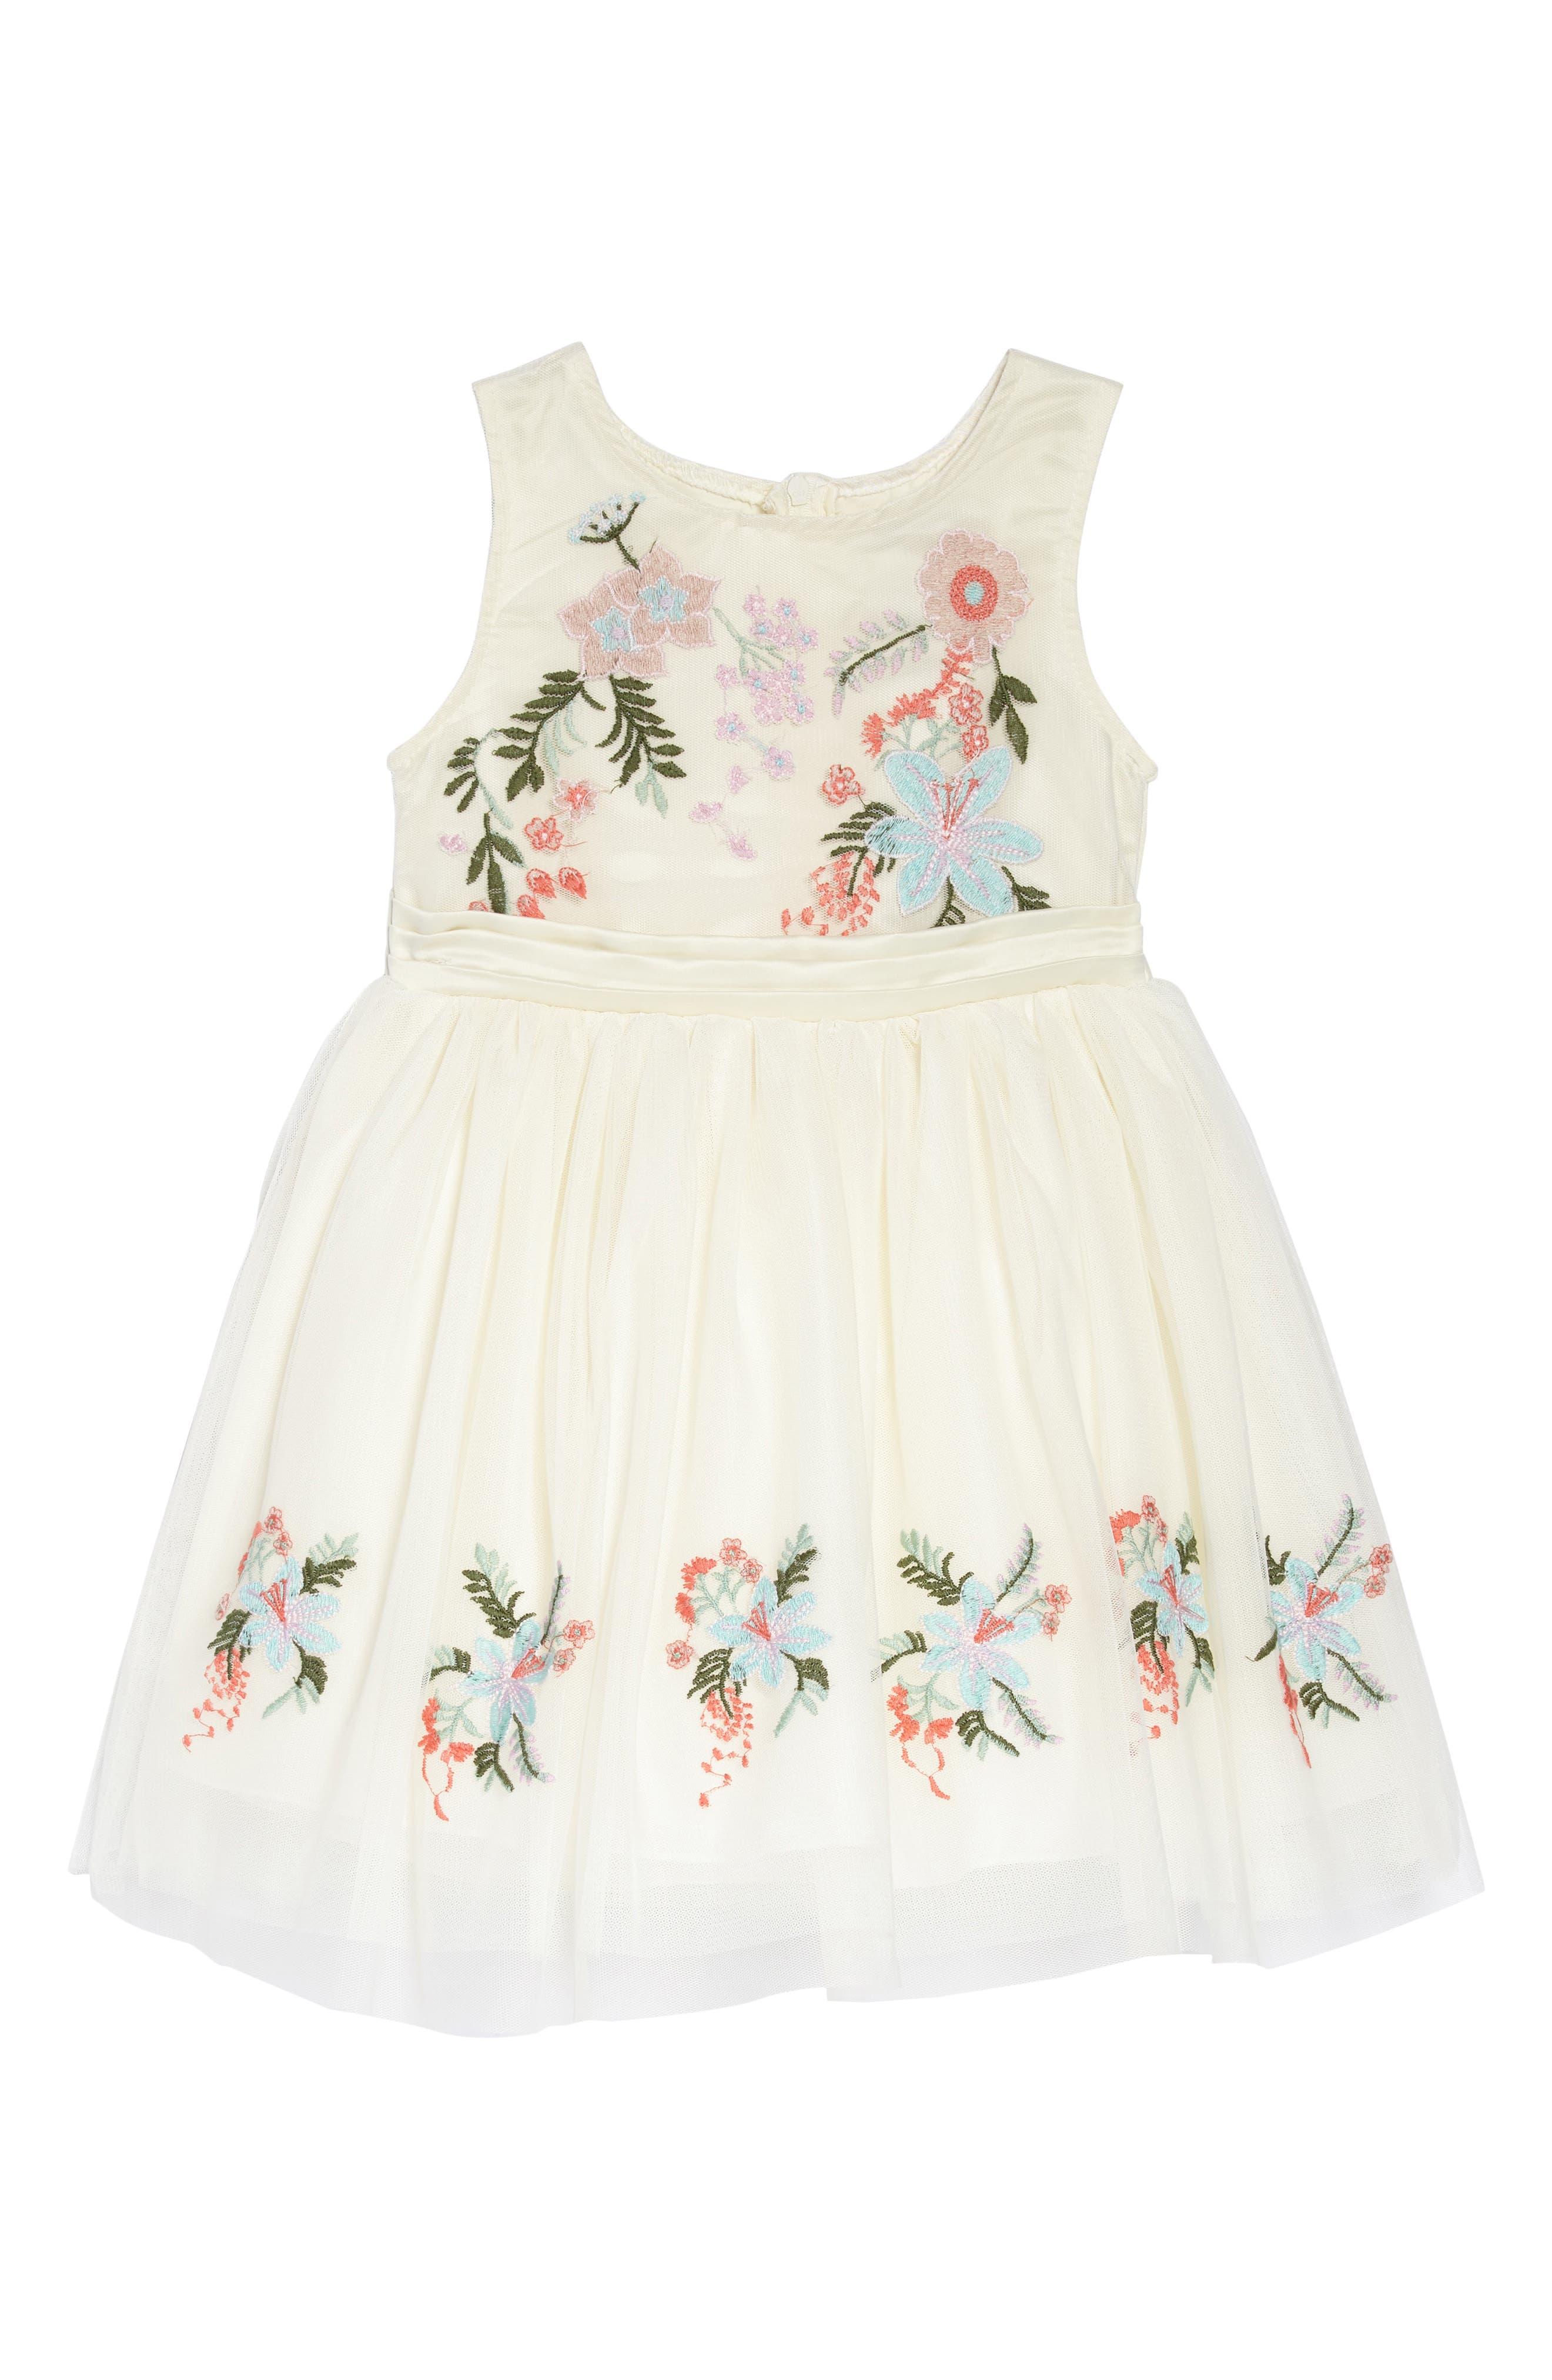 Main Image - Nanette Lepore Flower Embroidered Party Dress (Toddler Girls & Little Girls)